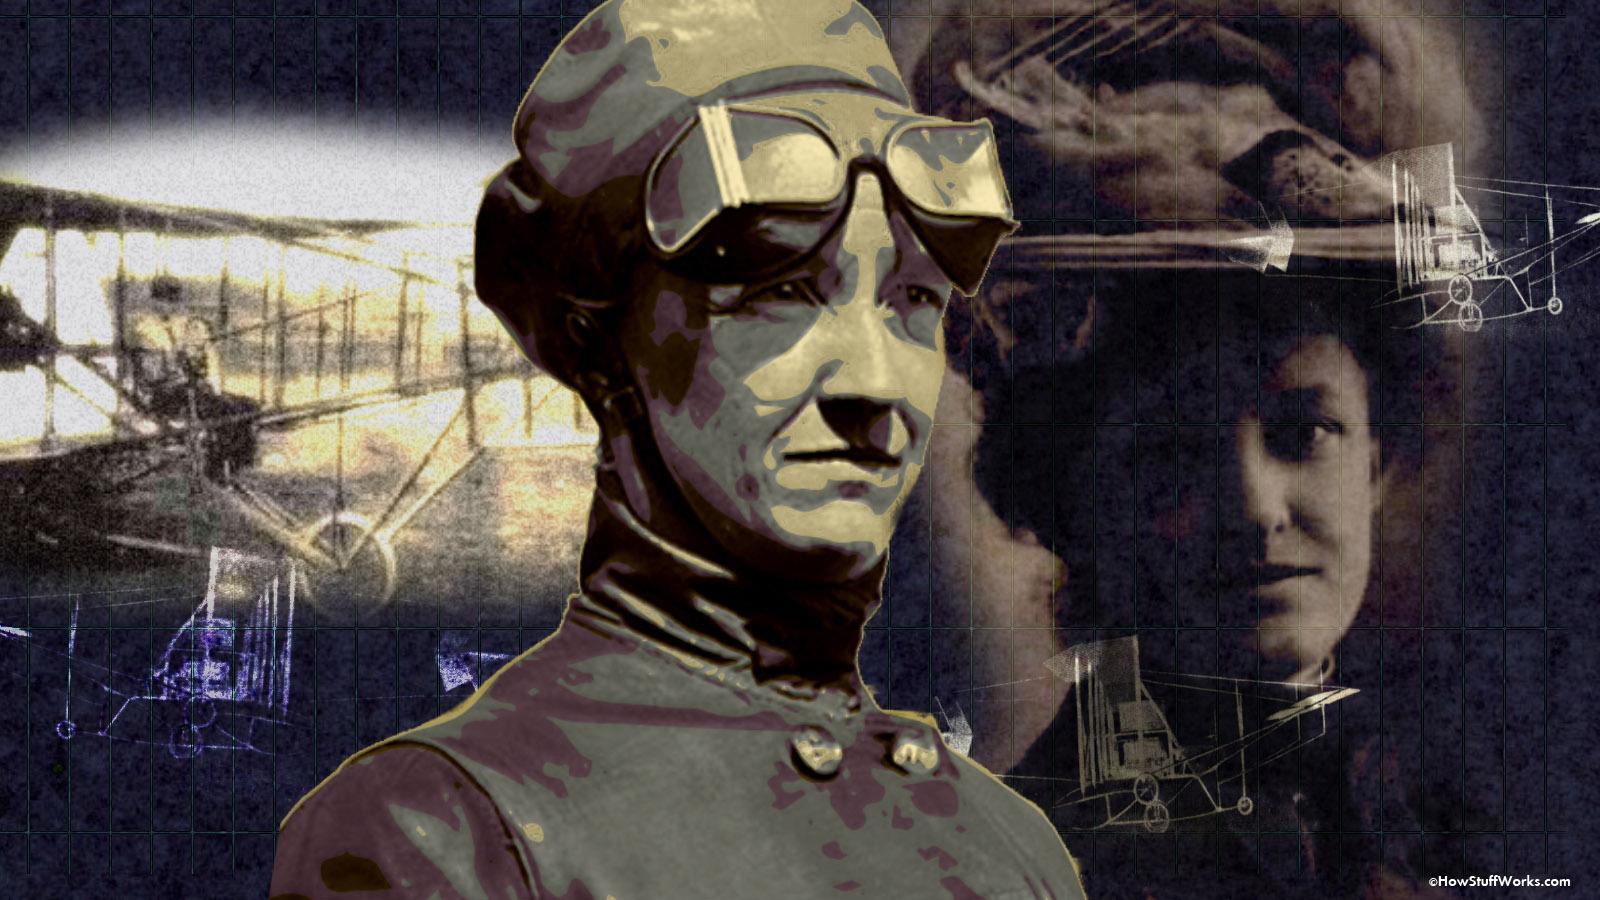 Before Earhart, There Was Aviation Trailblazer Bessica Raiche